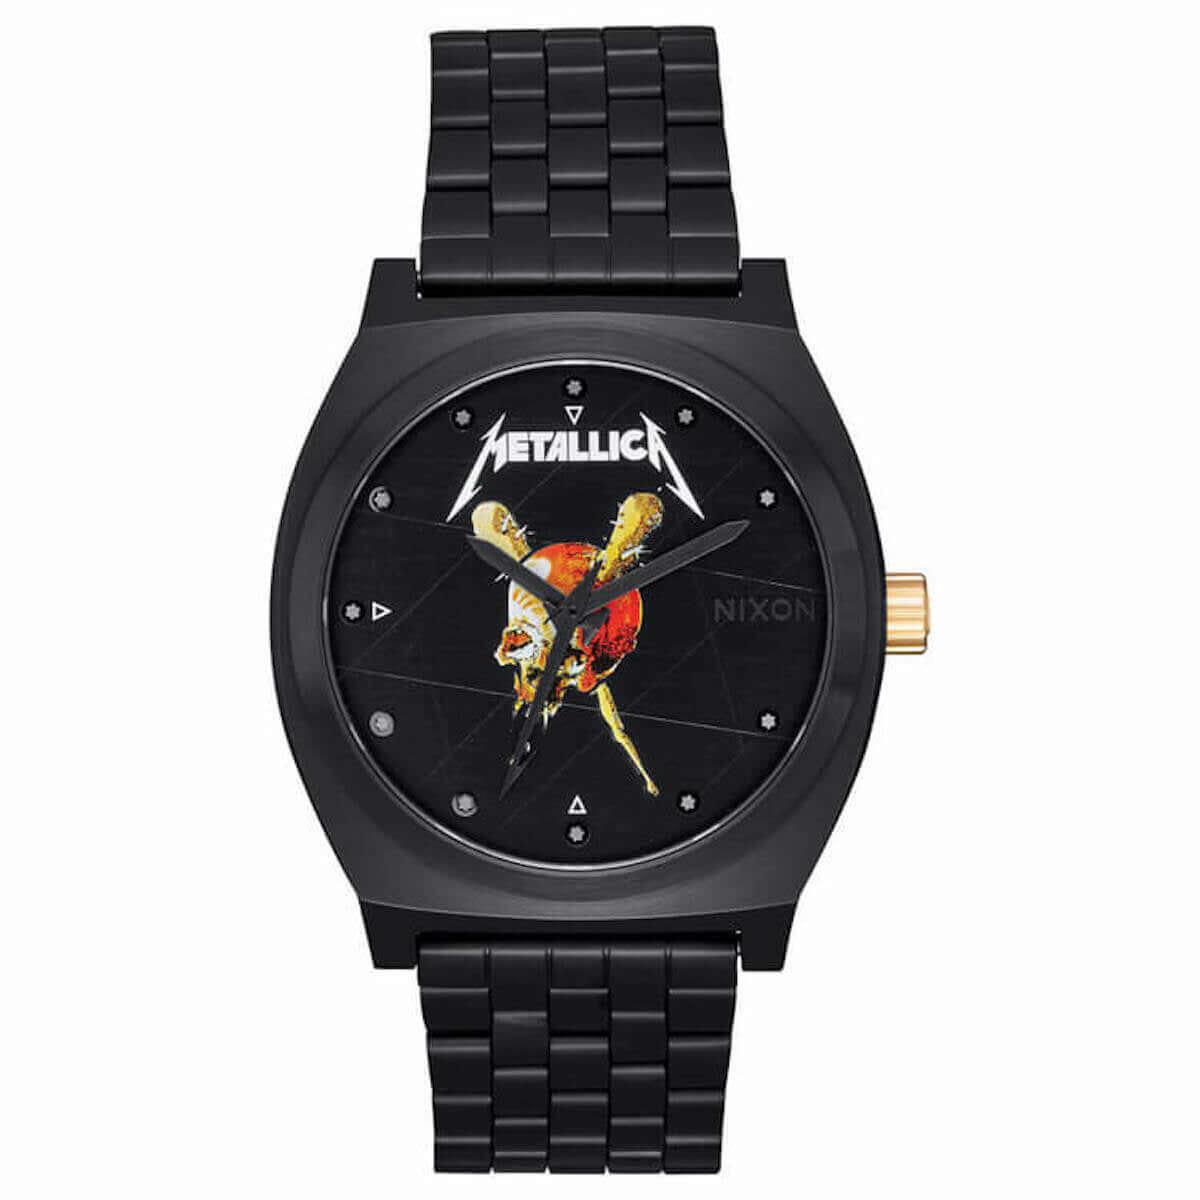 METALLICA X NIXON メタリカの名盤が腕時計に! music181112_nixon-metallica_5-1200x1200